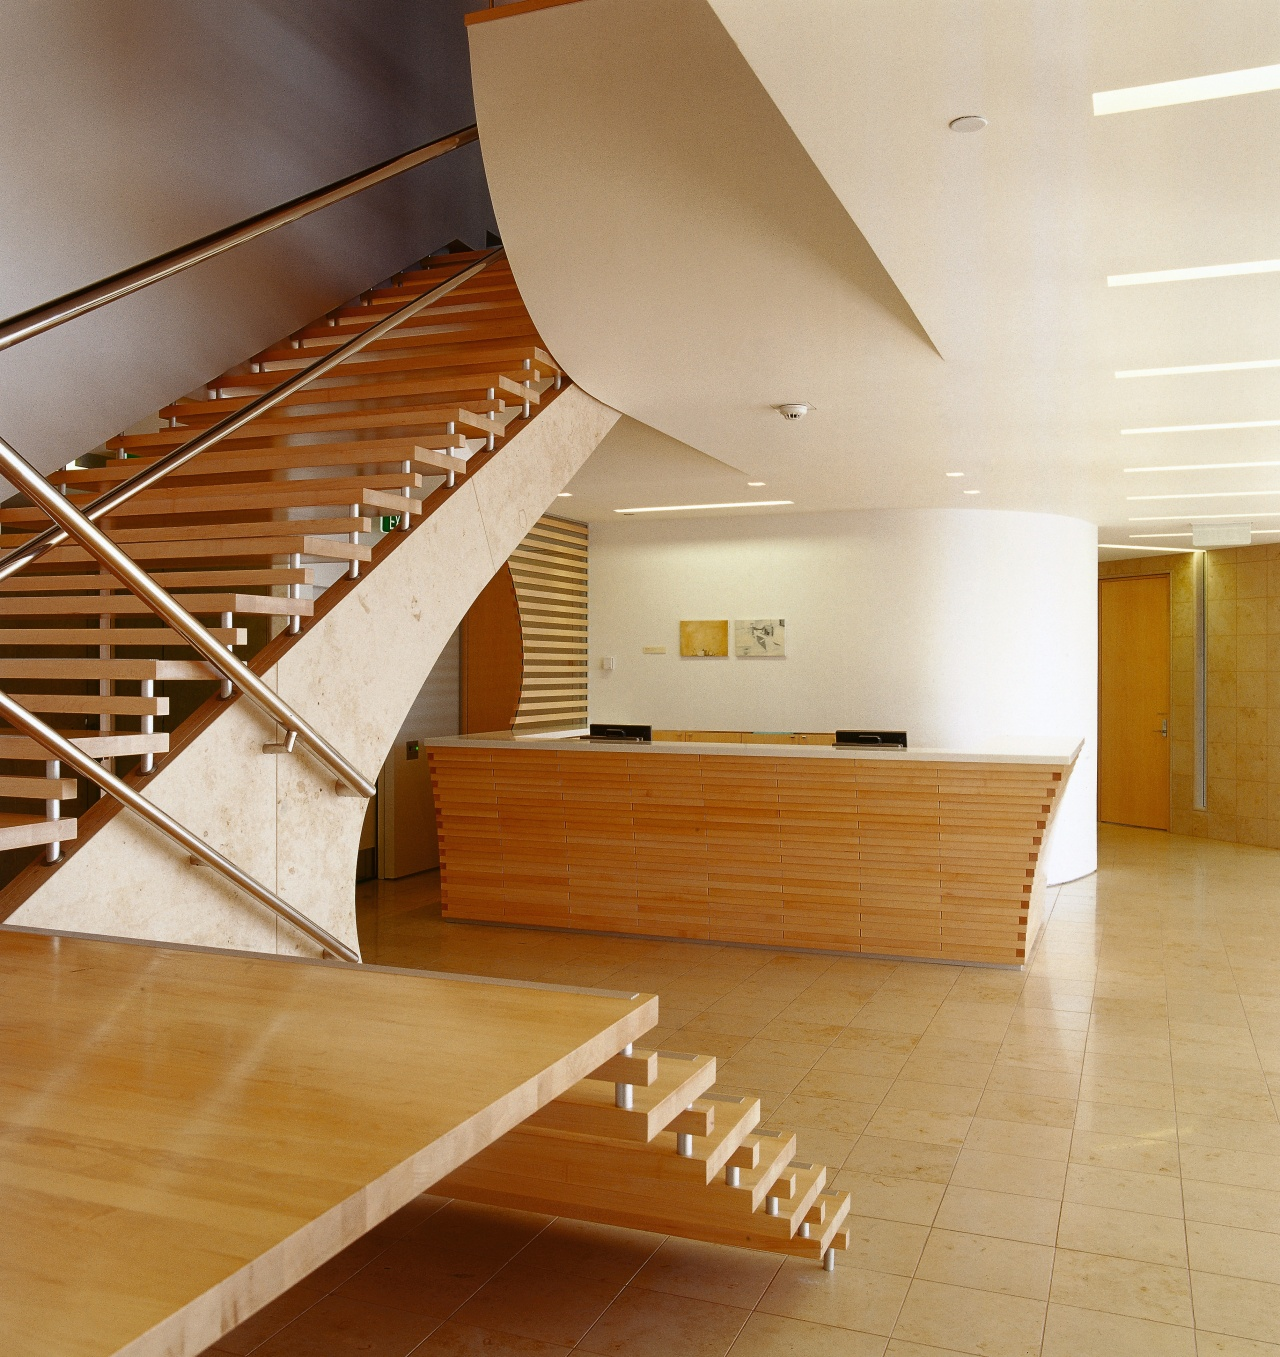 A view o fthe wooden staircase, tiled floor, architecture, ceiling, daylighting, floor, flooring, handrail, hardwood, interior design, laminate flooring, lobby, real estate, stairs, wood, wood flooring, orange, brown